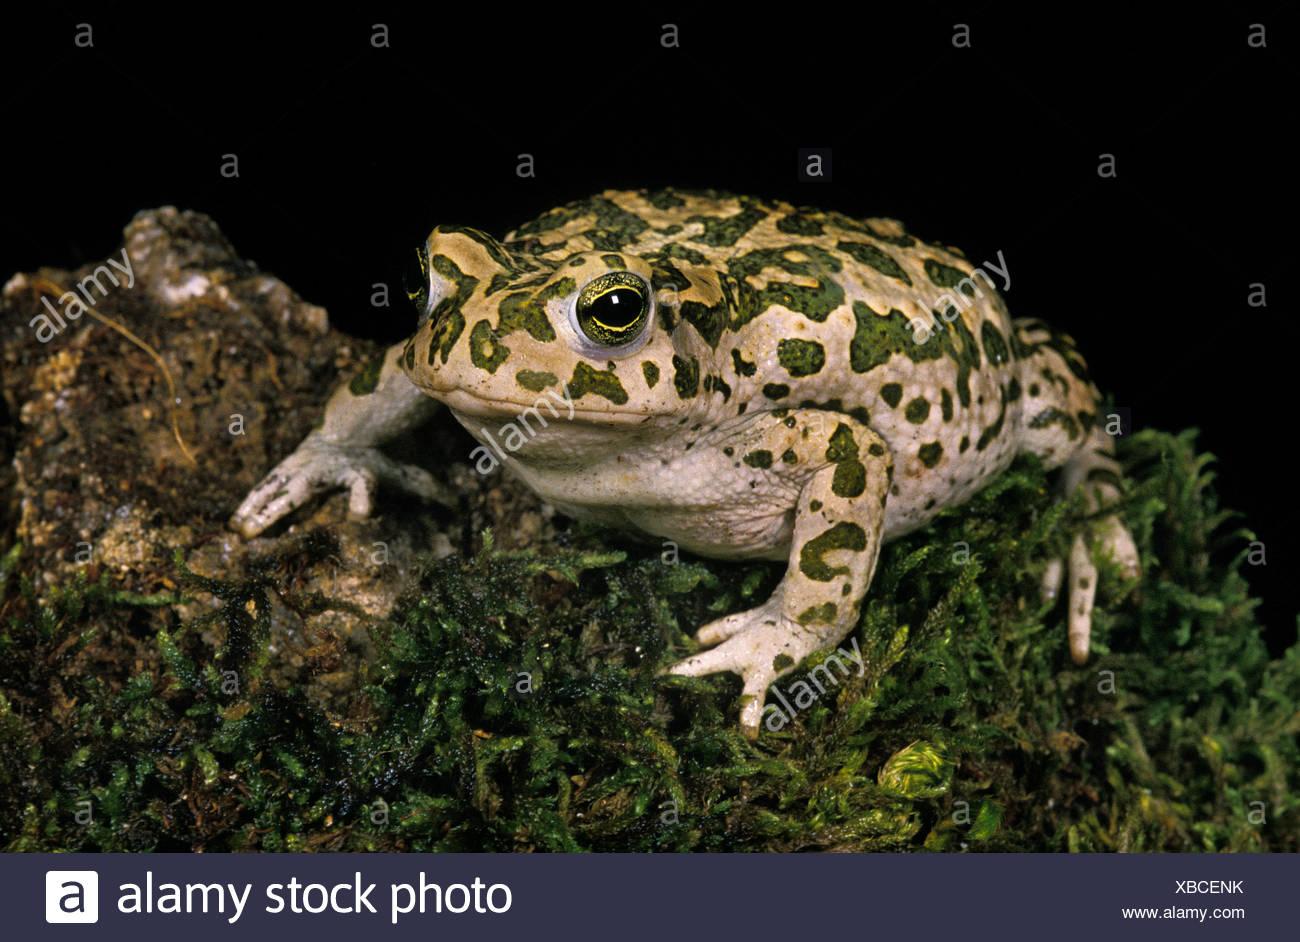 Green Toad, bufo viridis - Stock Image